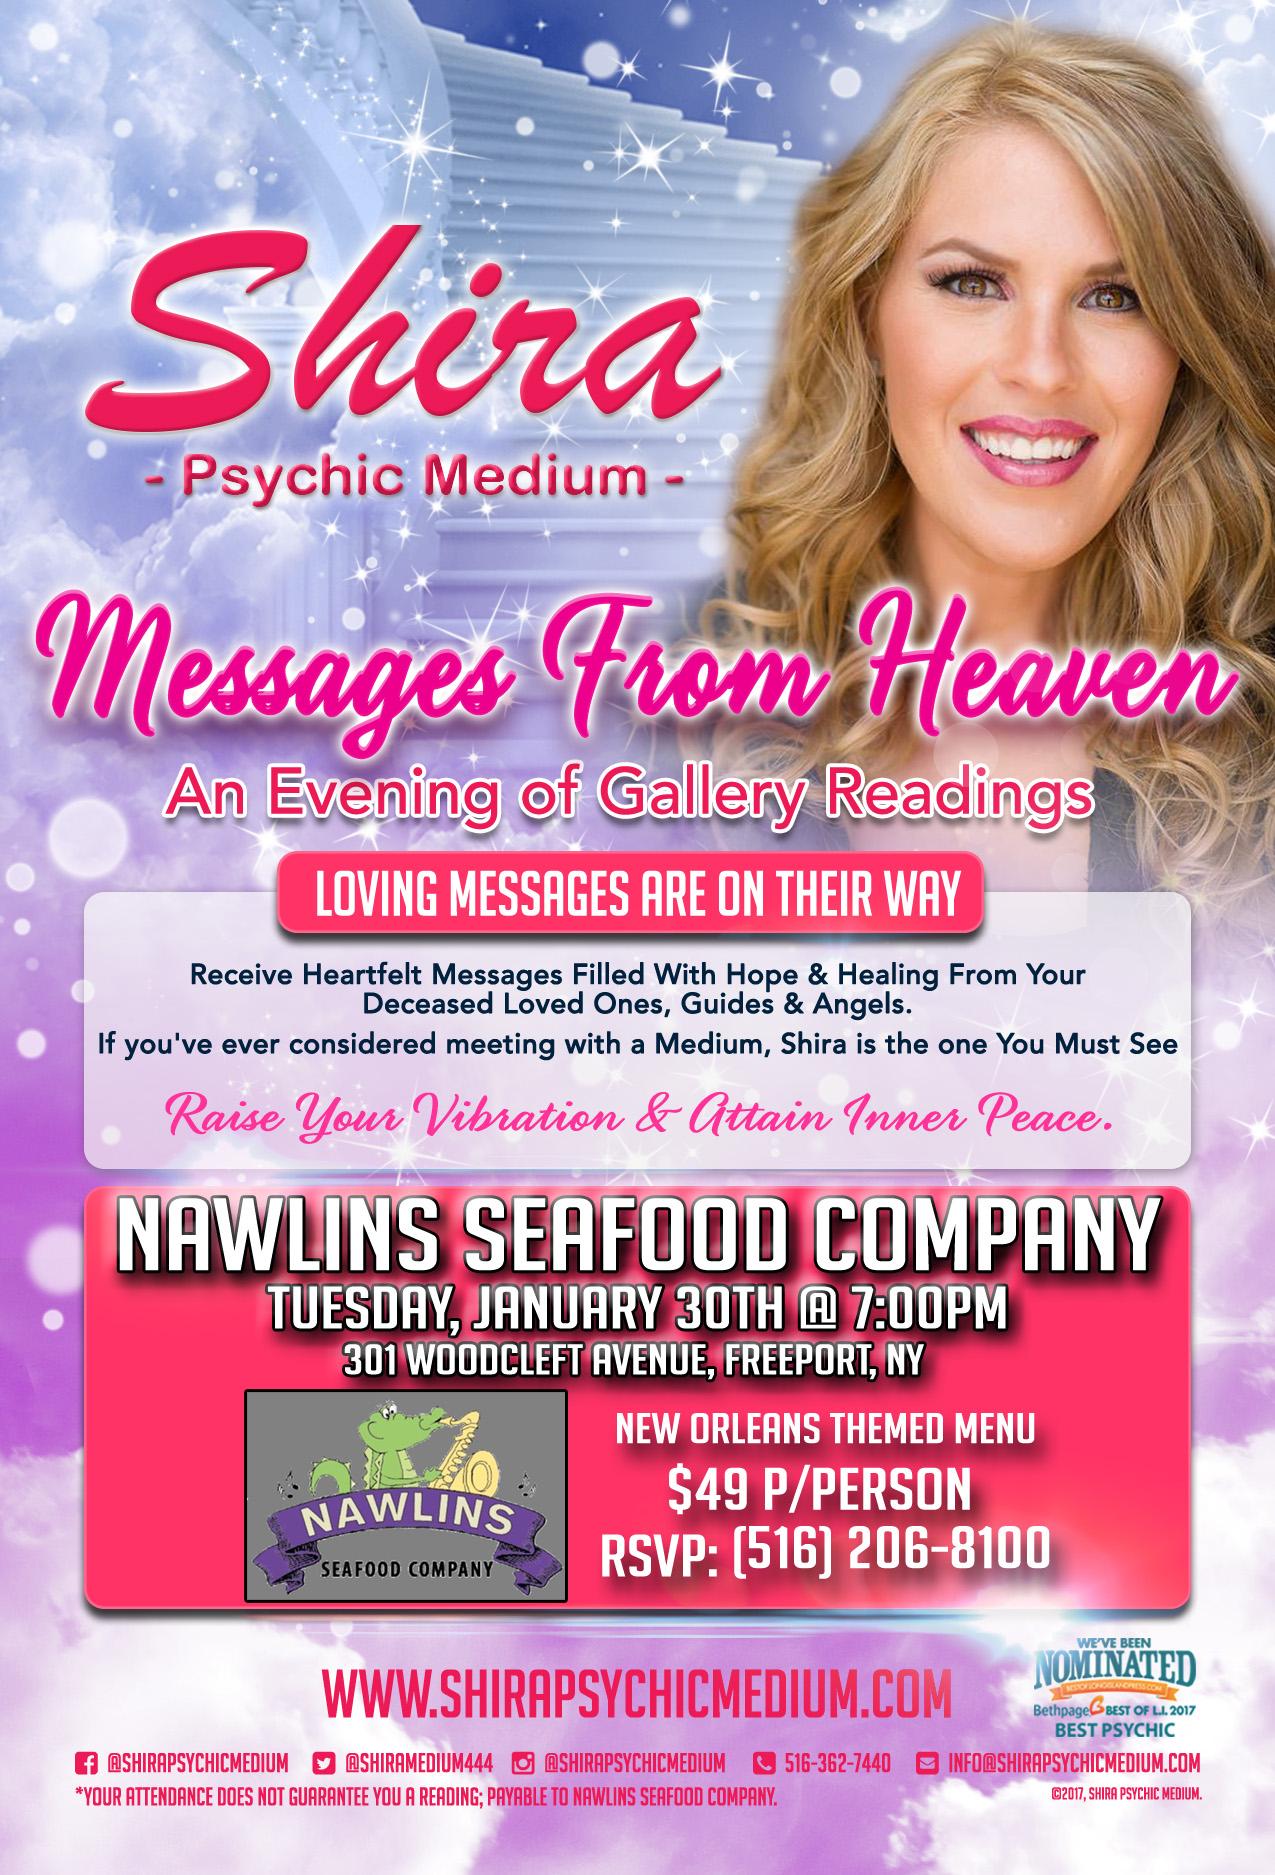 shira psychic medium Nawlins Seafood Company Long Island Restaurant